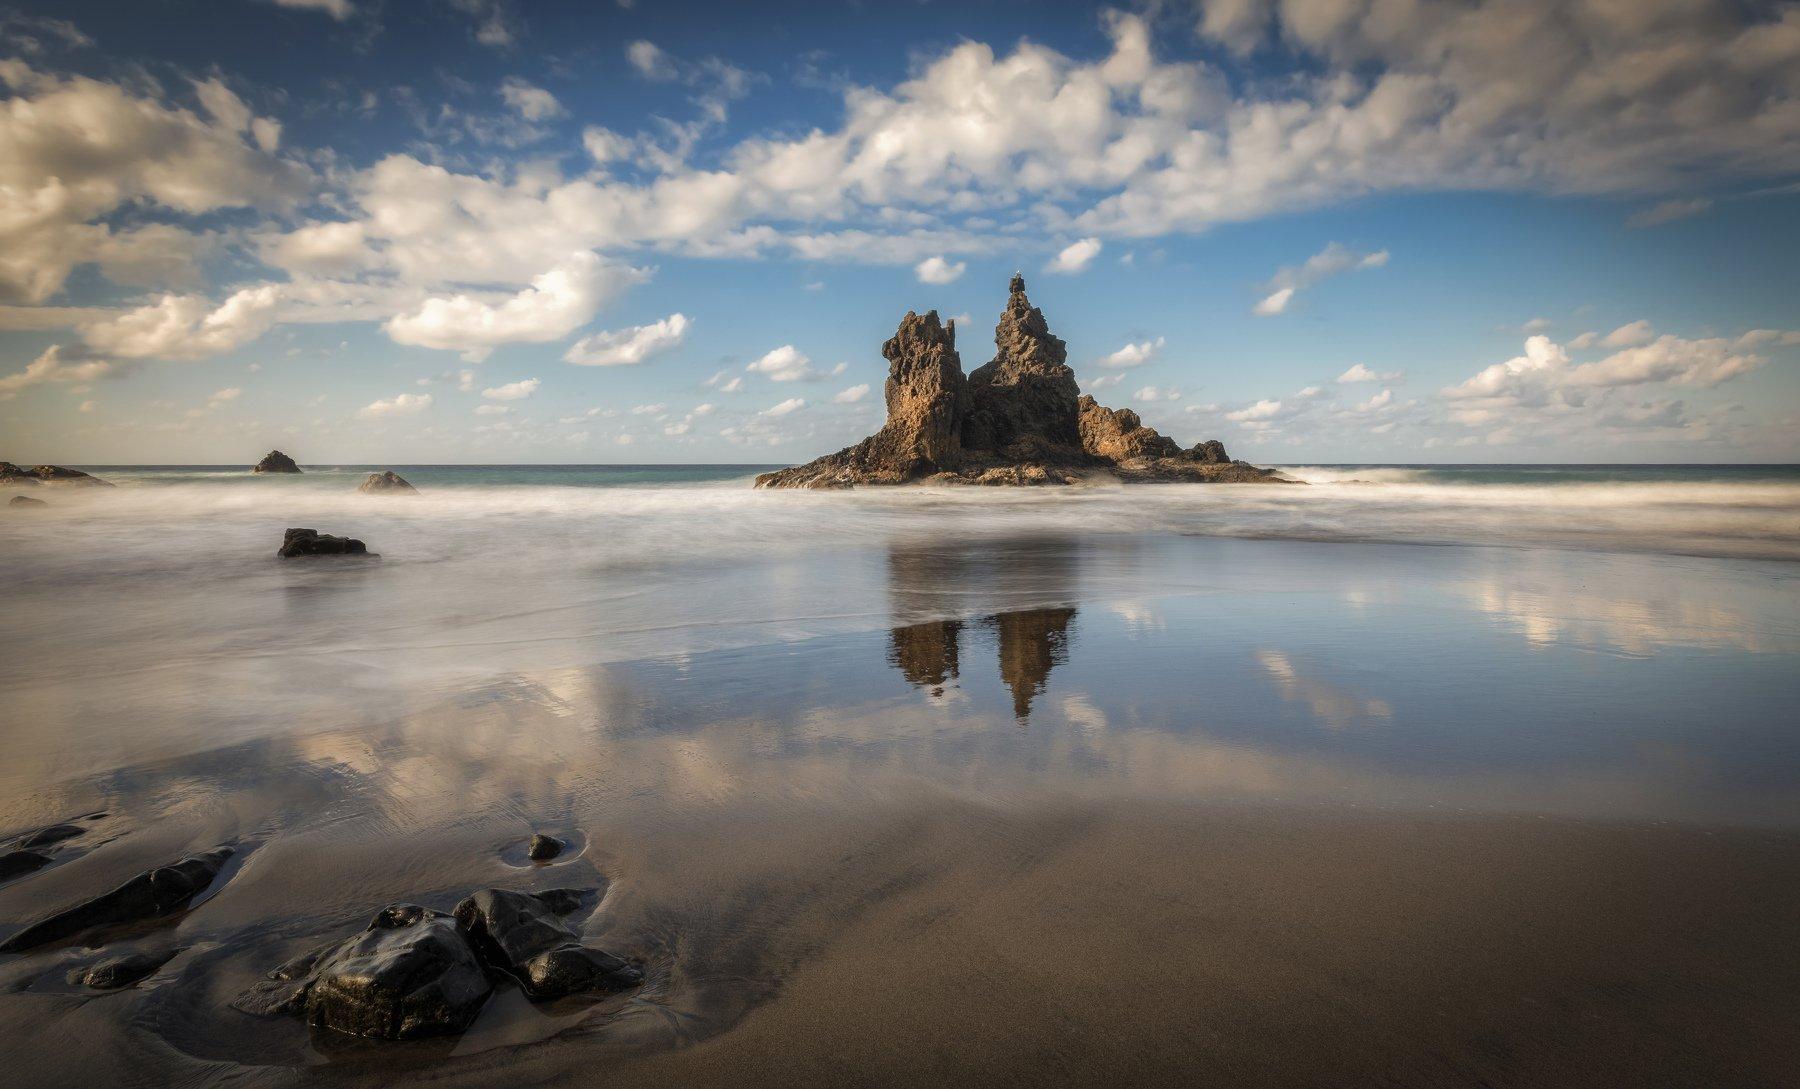 пляж, отлив, океан, скалы, Alexandr Bezmolitvenny